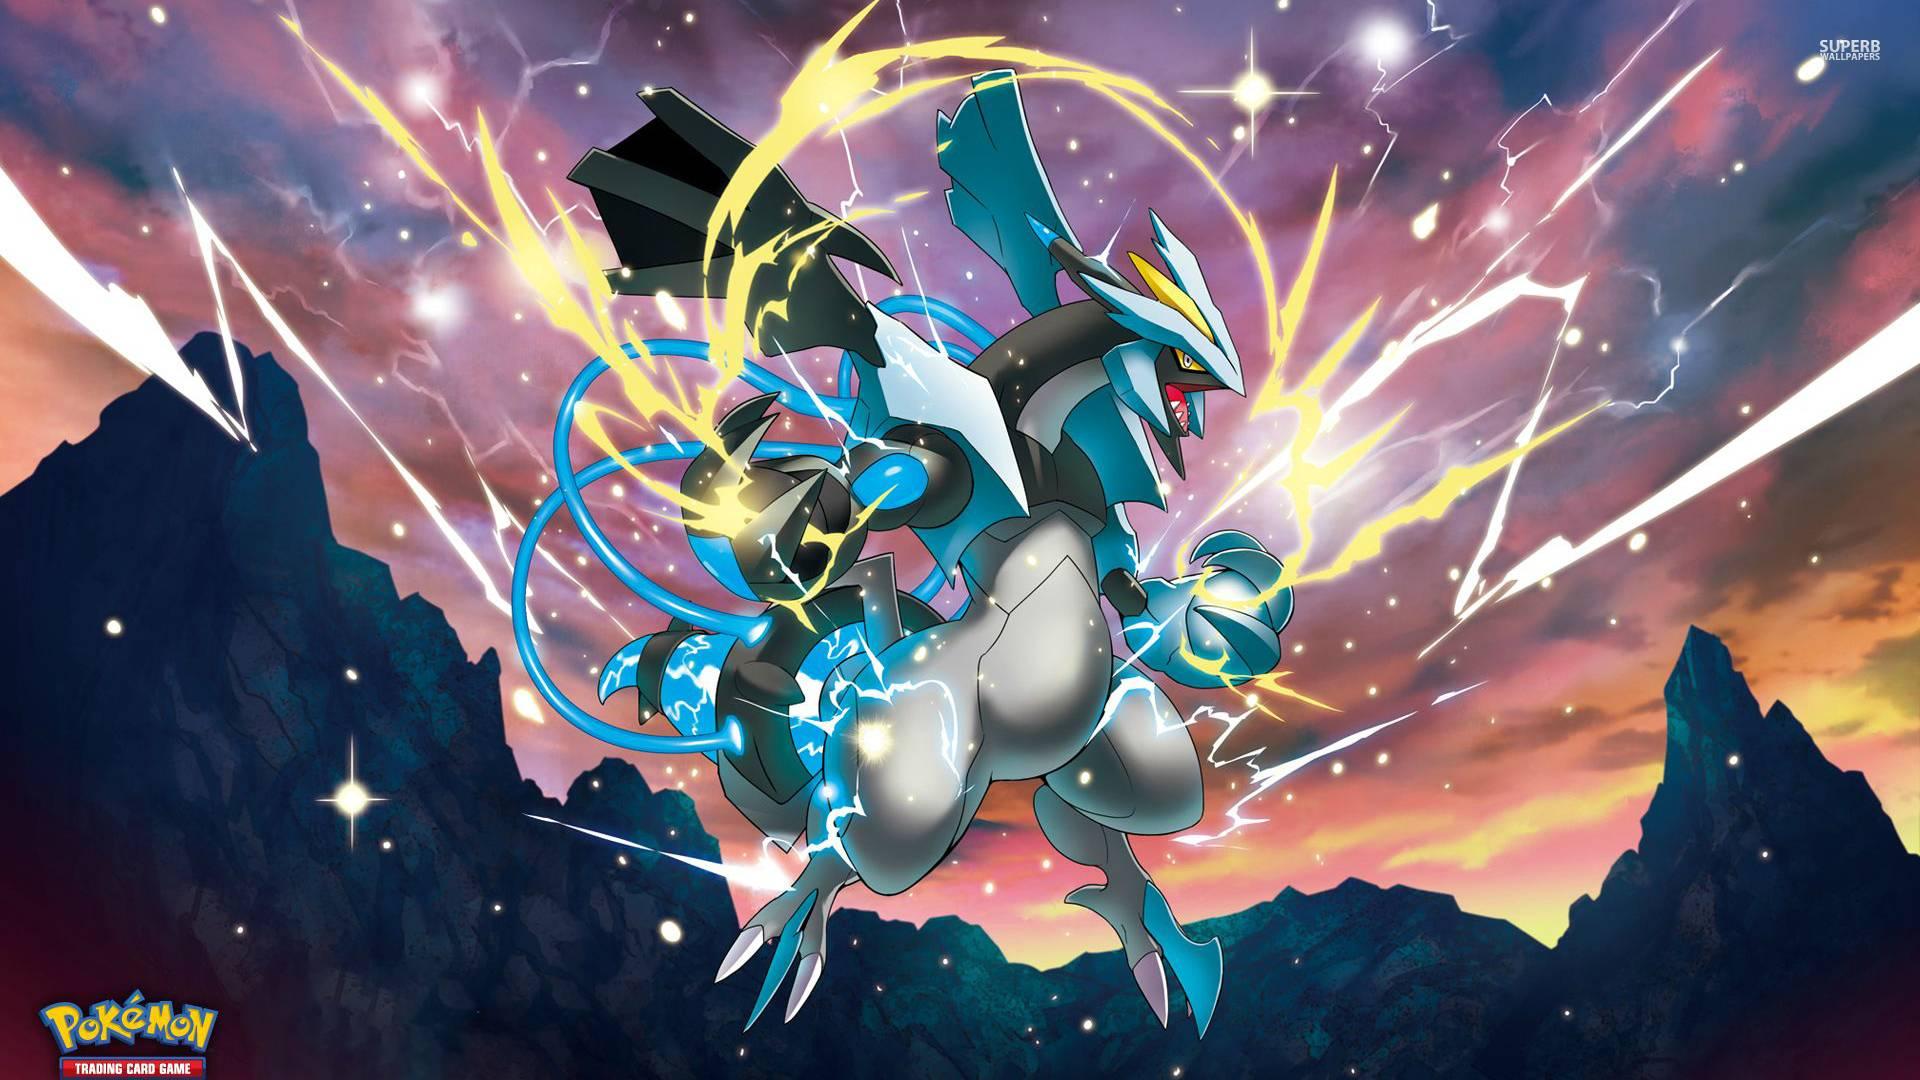 Download Pokemon Wallpaper In Hd Hd Backgrounds Download